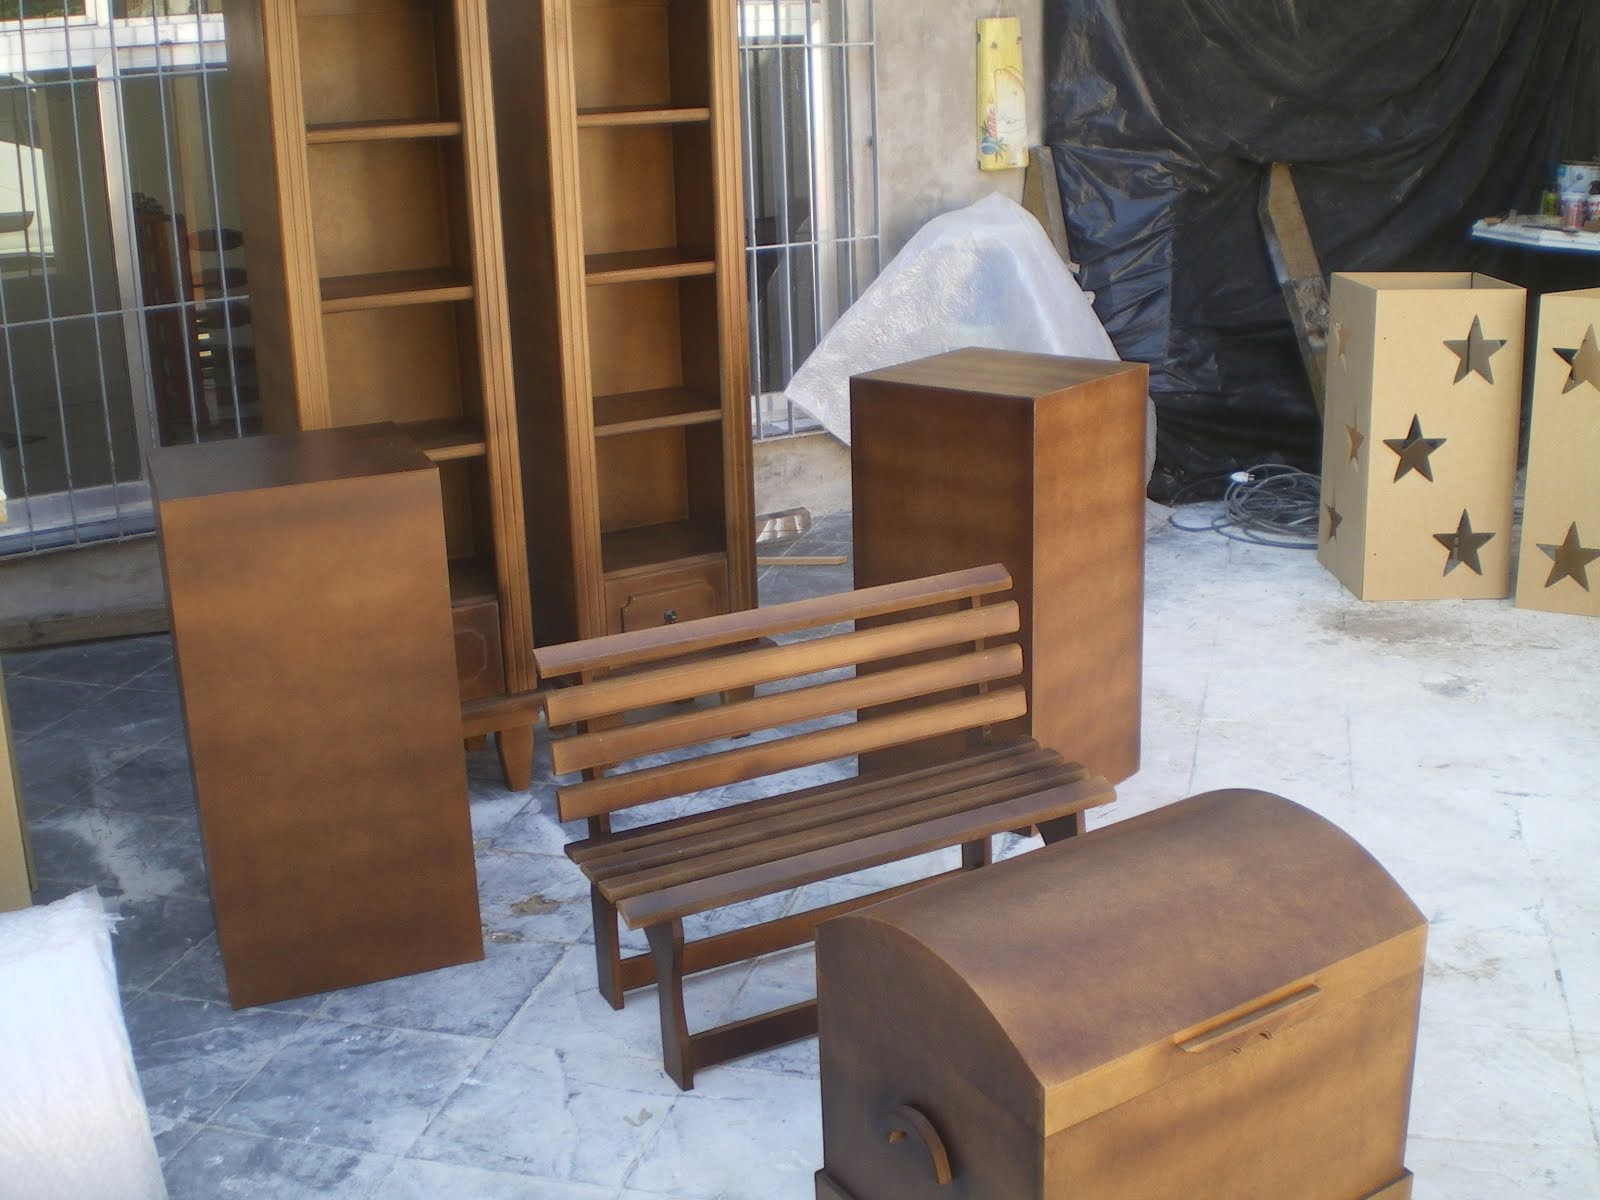 kit  de peças  rusticas